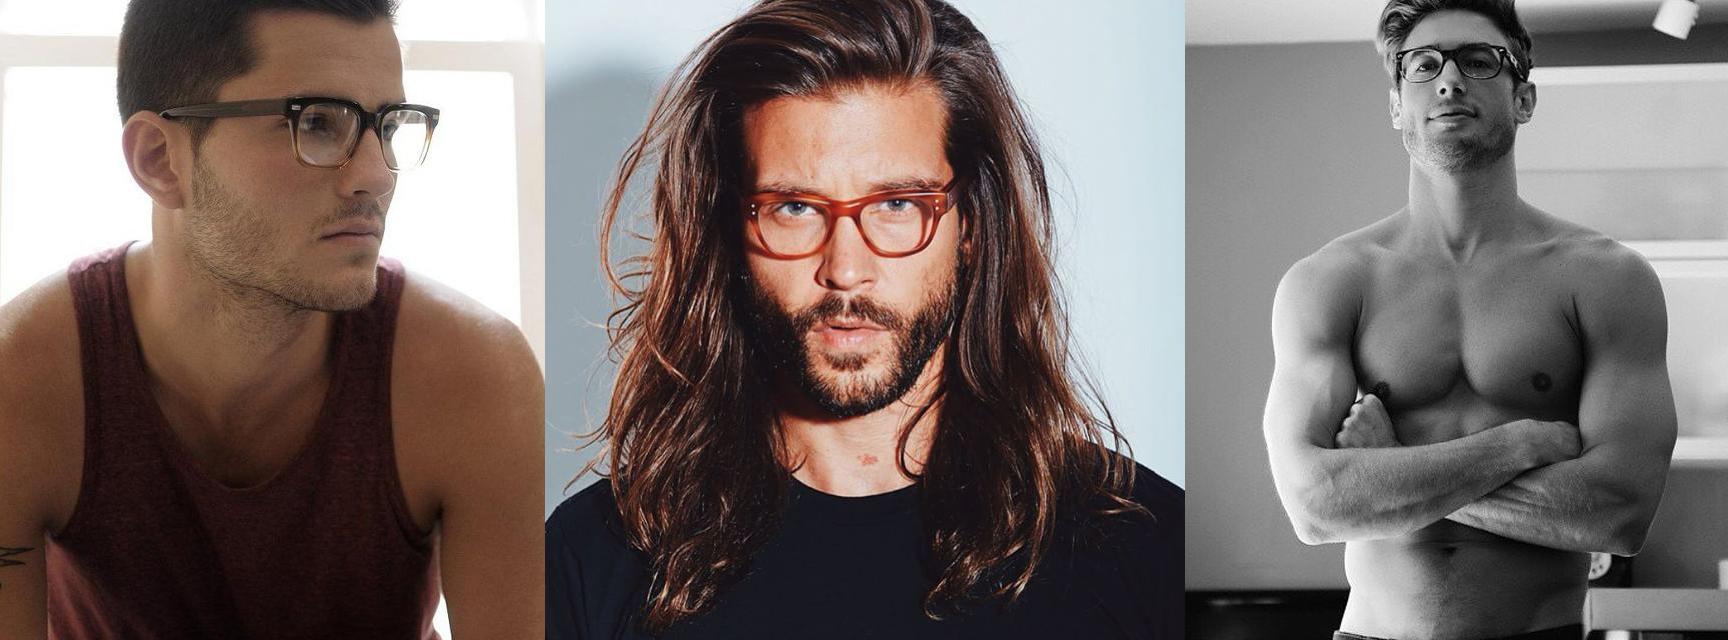 Las mejores fotos de t os buenos con gafas estarguapas for Hombre sexis en ropa interior